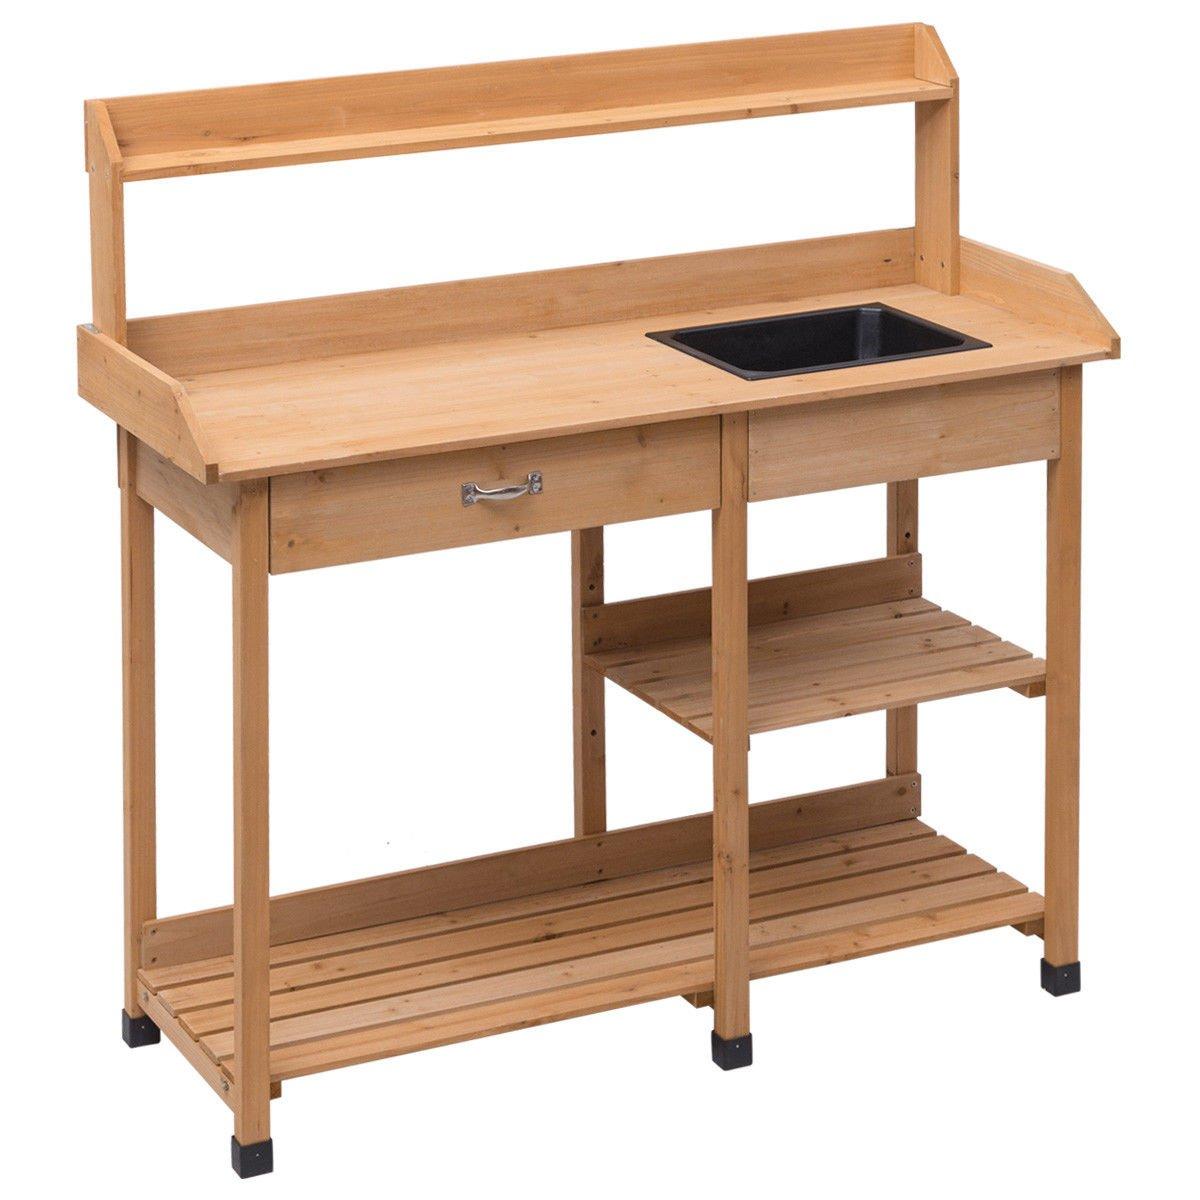 Fir Wood Garden Potting Bench Table Patio Storage Shelf Work Station w/ Drawer